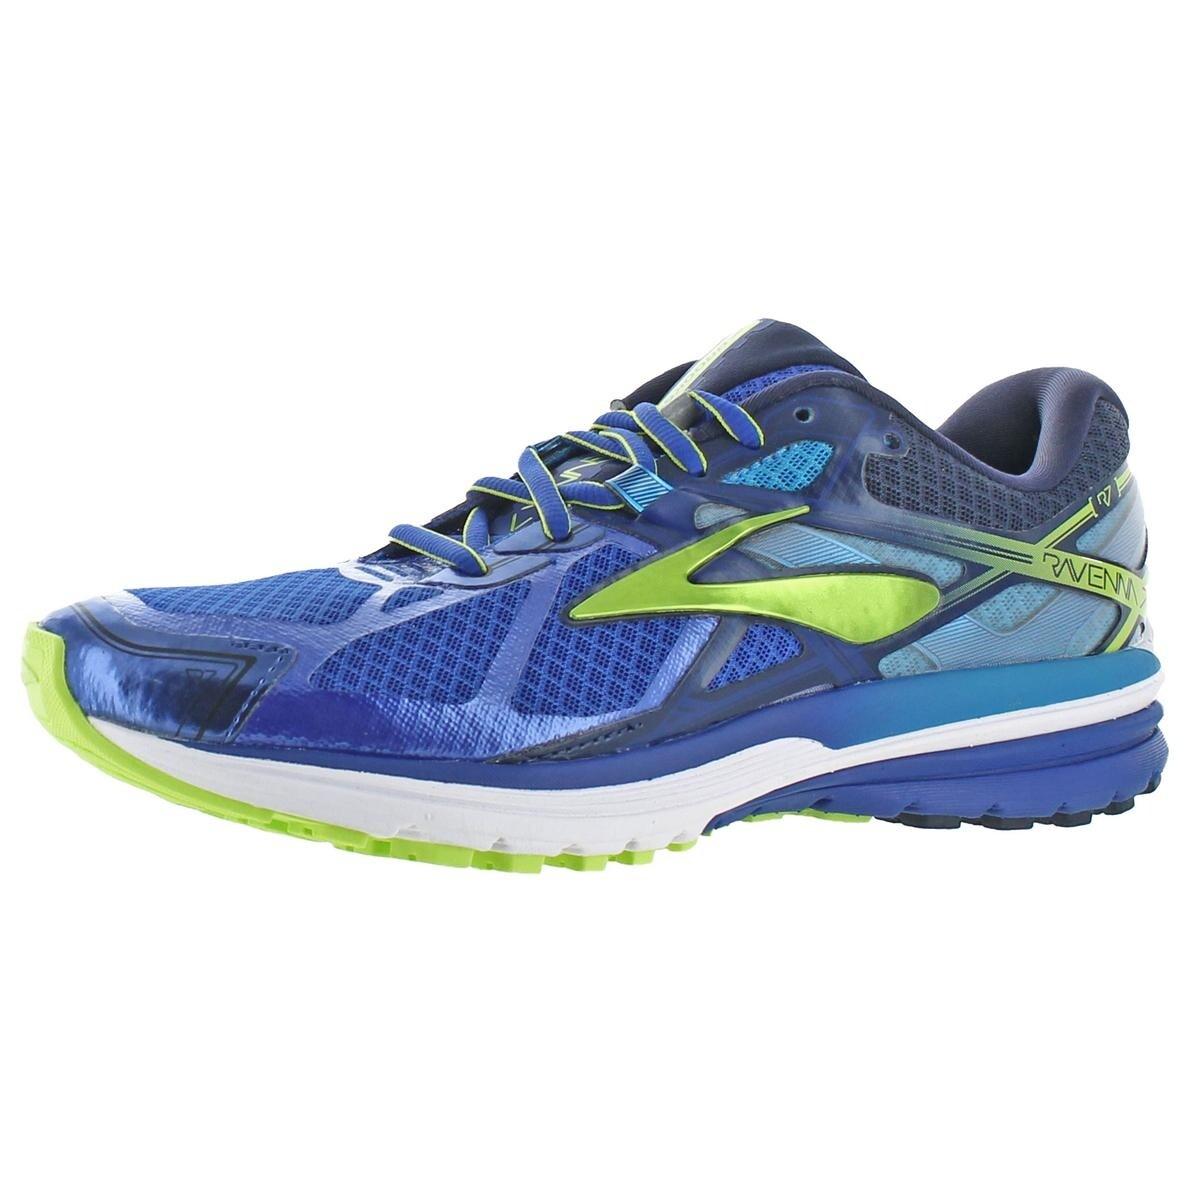 20201dcf5fe Shop Brooks Mens Ravenna 7 Running Shoes Flextra Fitness - Free ...